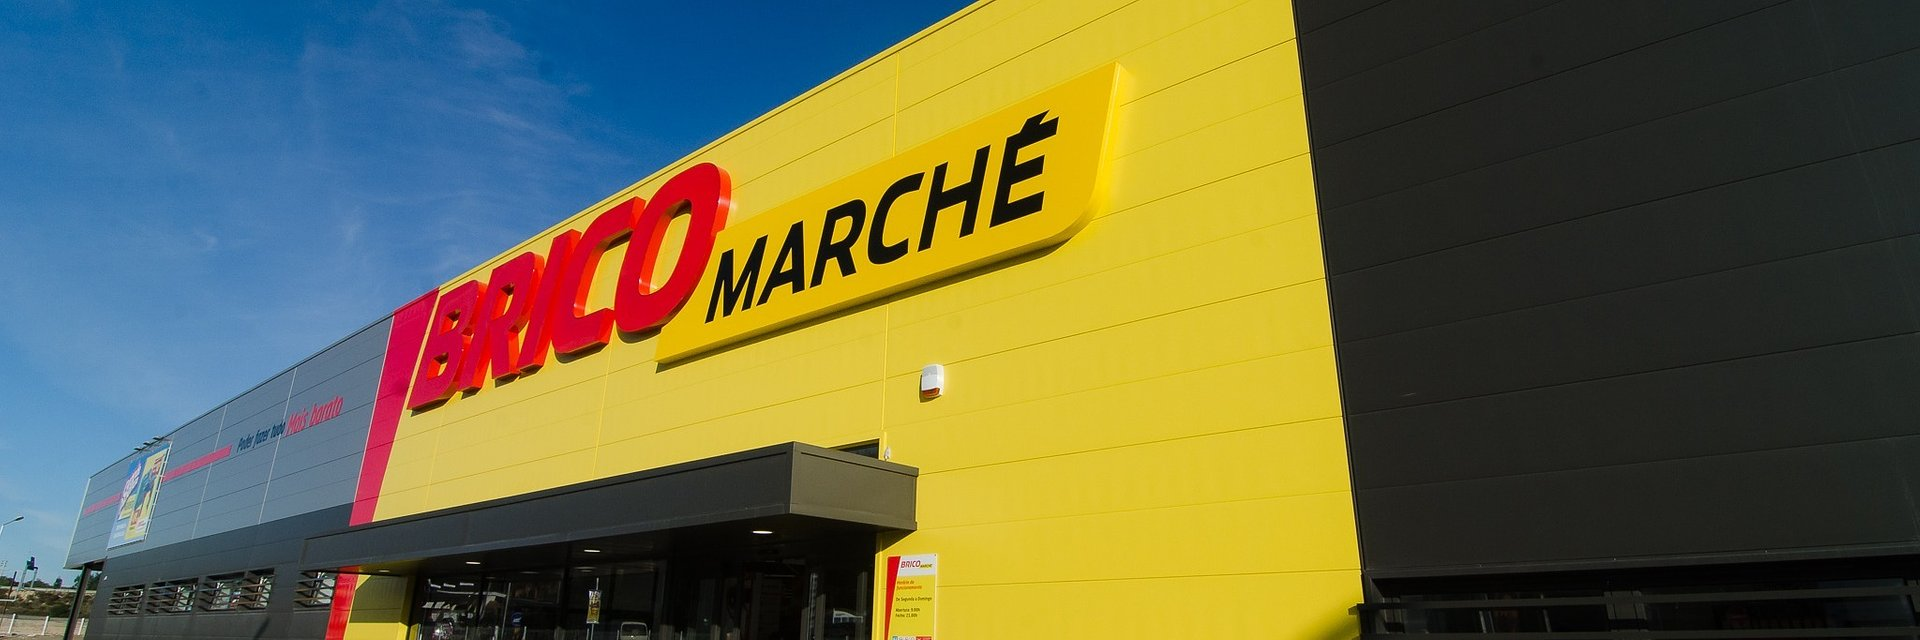 Bricomarché inaugura loja em Arcozelo